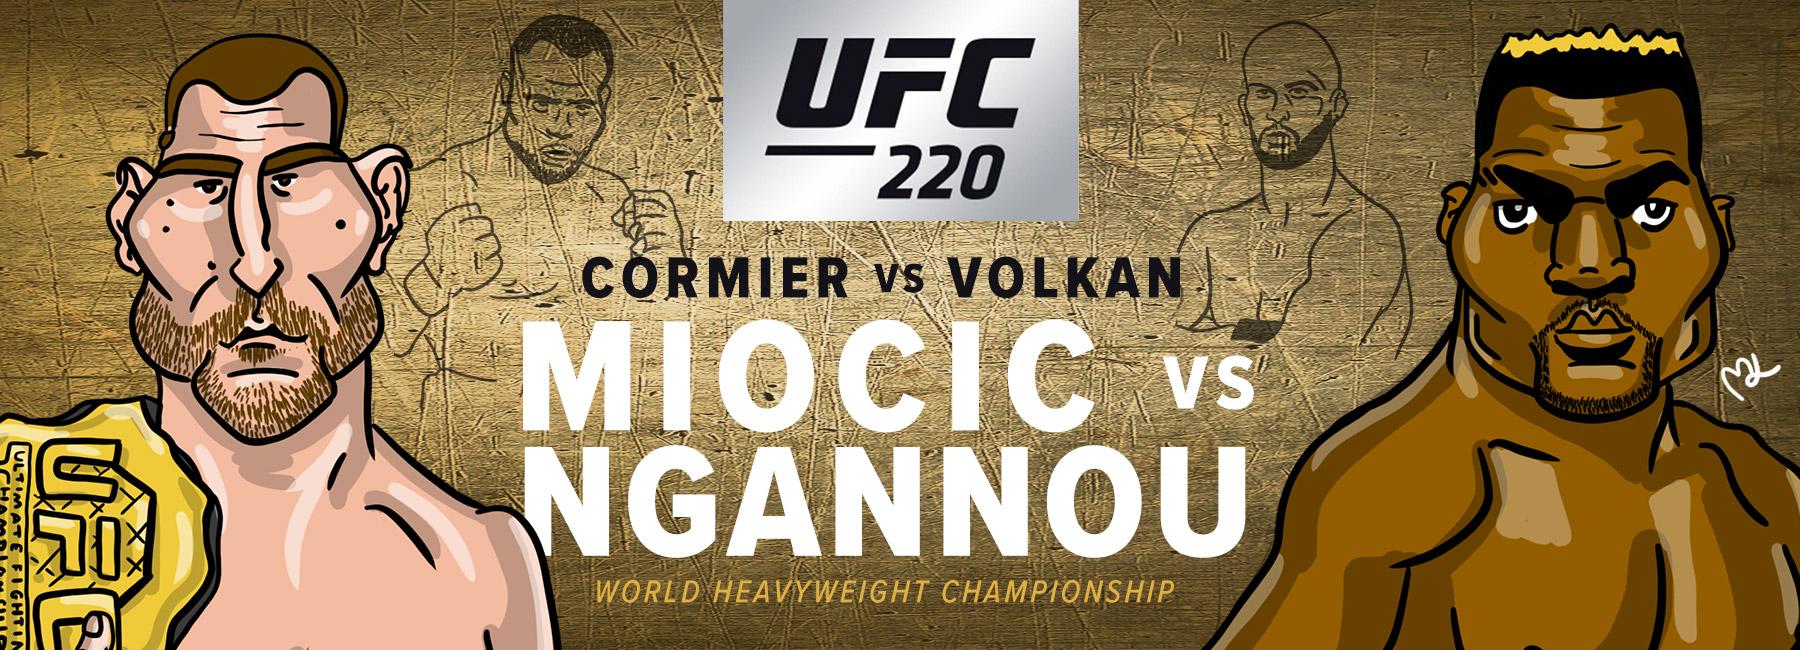 180118-UFC220-Horizontal.jpg